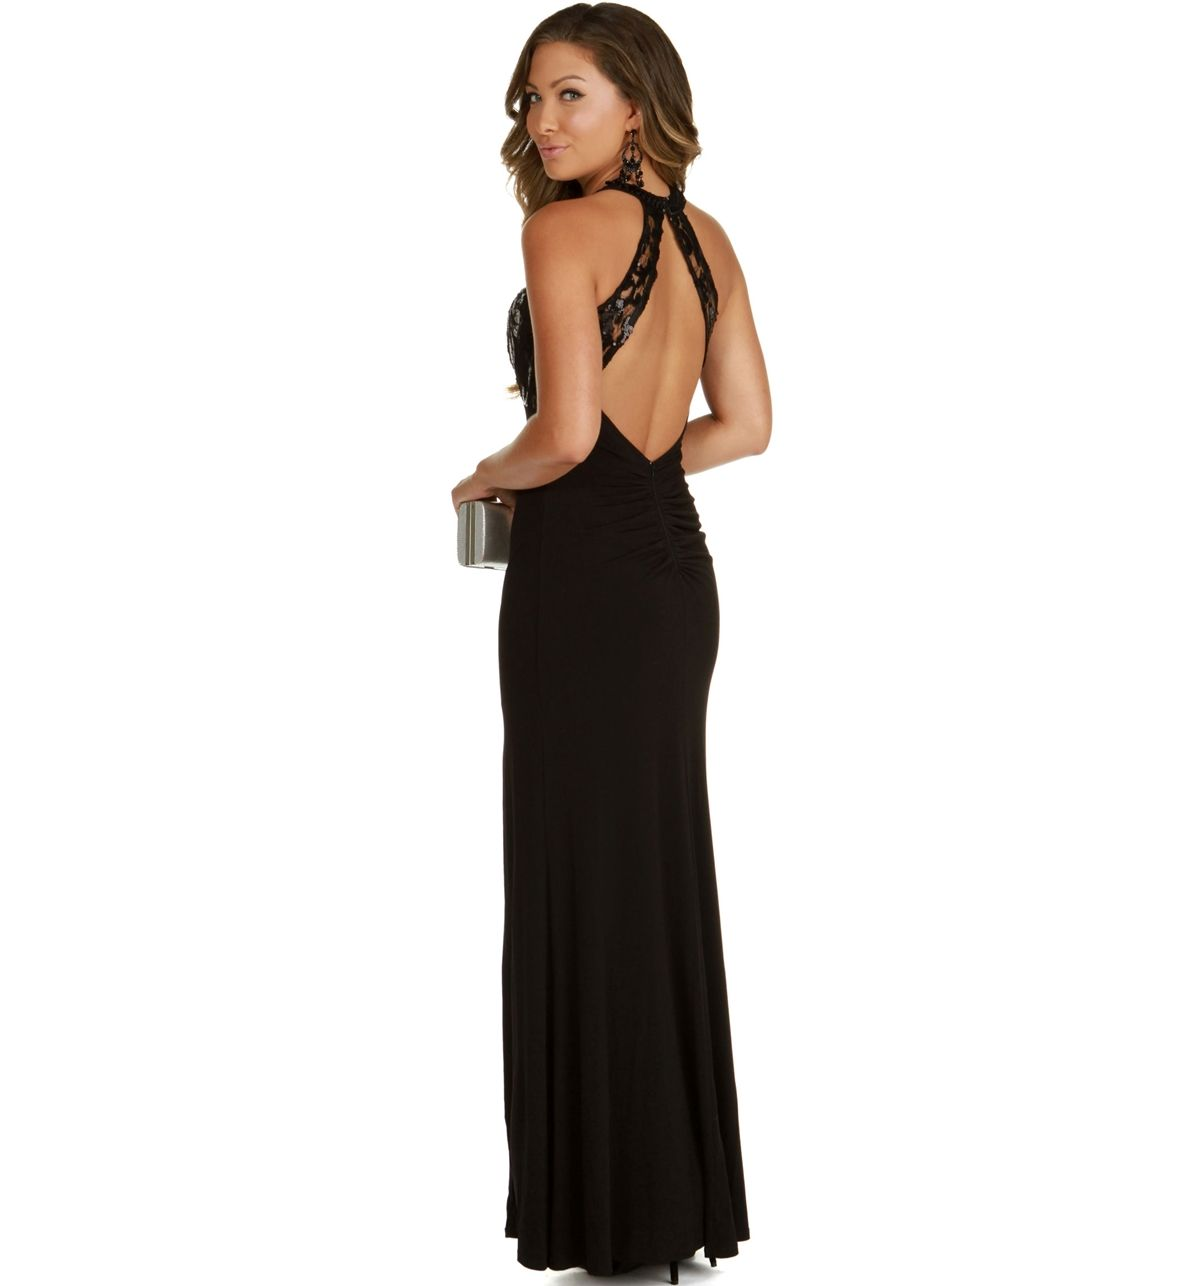 Angieblack prom dress senior year pinterest black prom